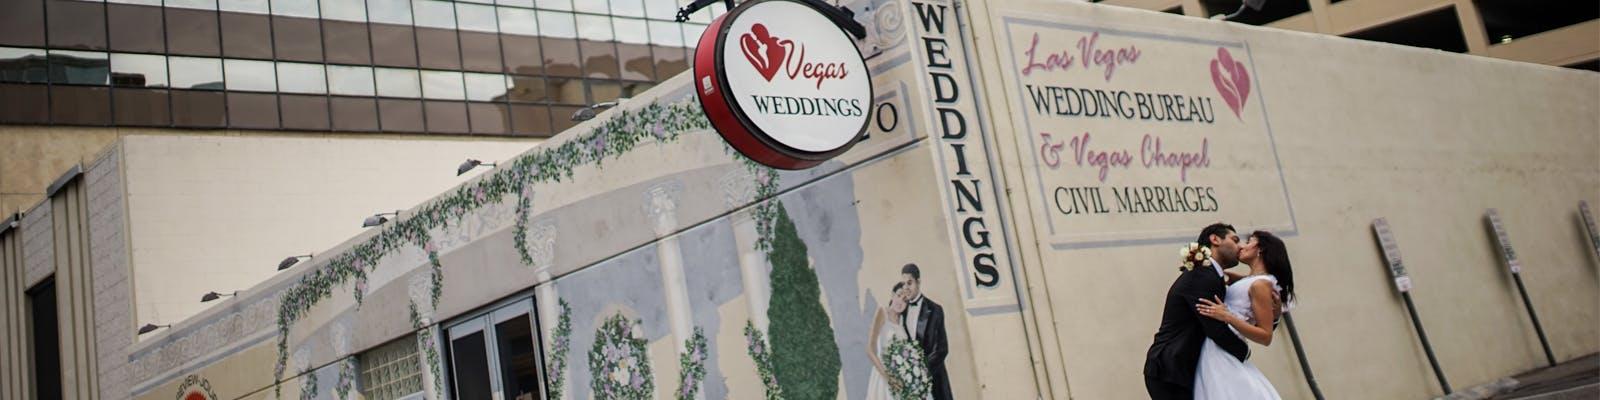 Wedding Chapels In Las Vegas